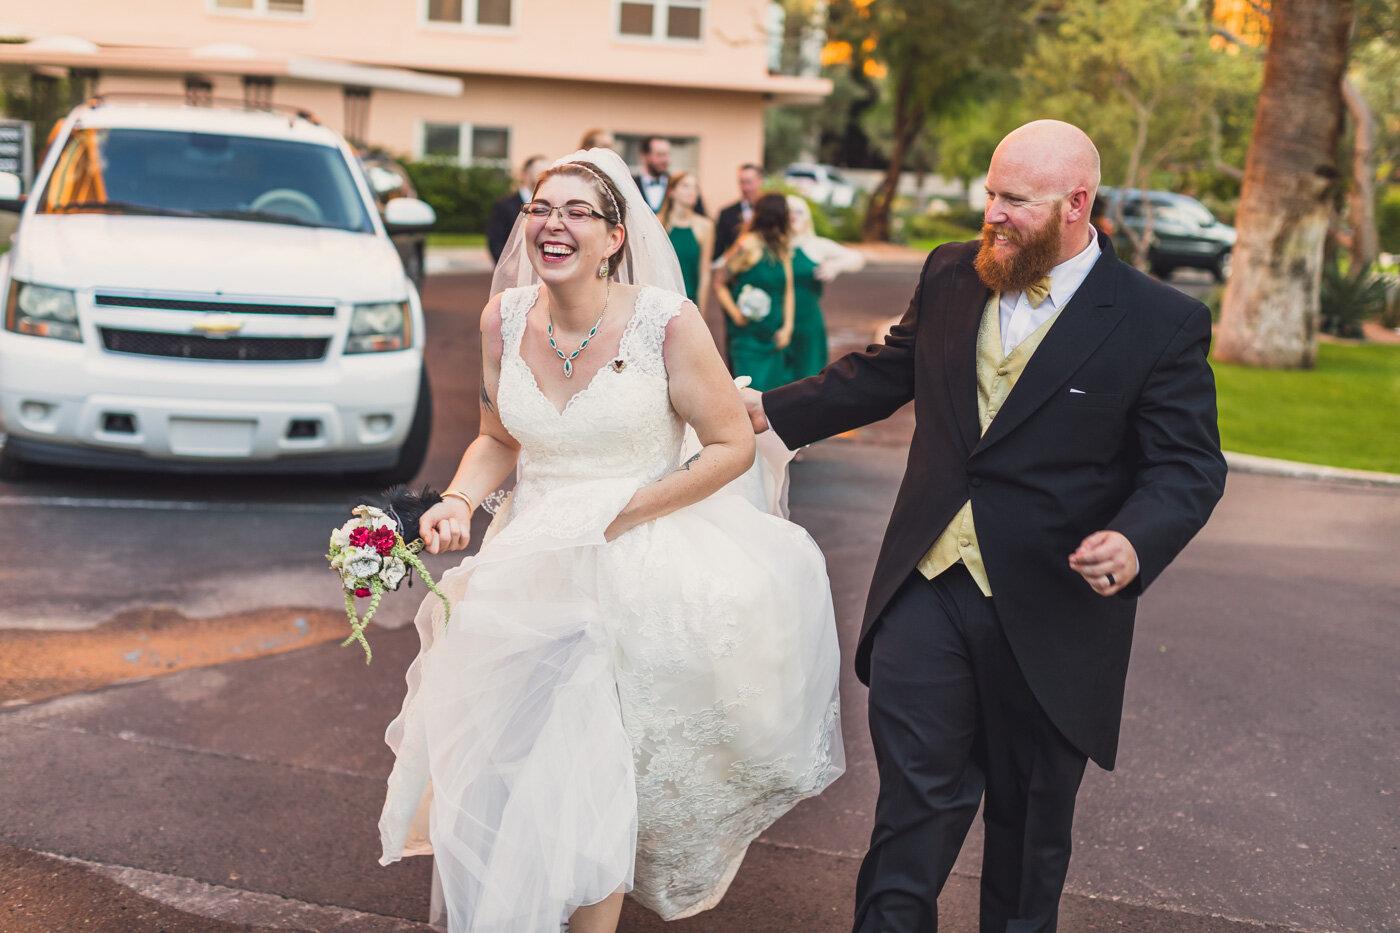 aaron-kes-photography-downtown-phoenix-wedding